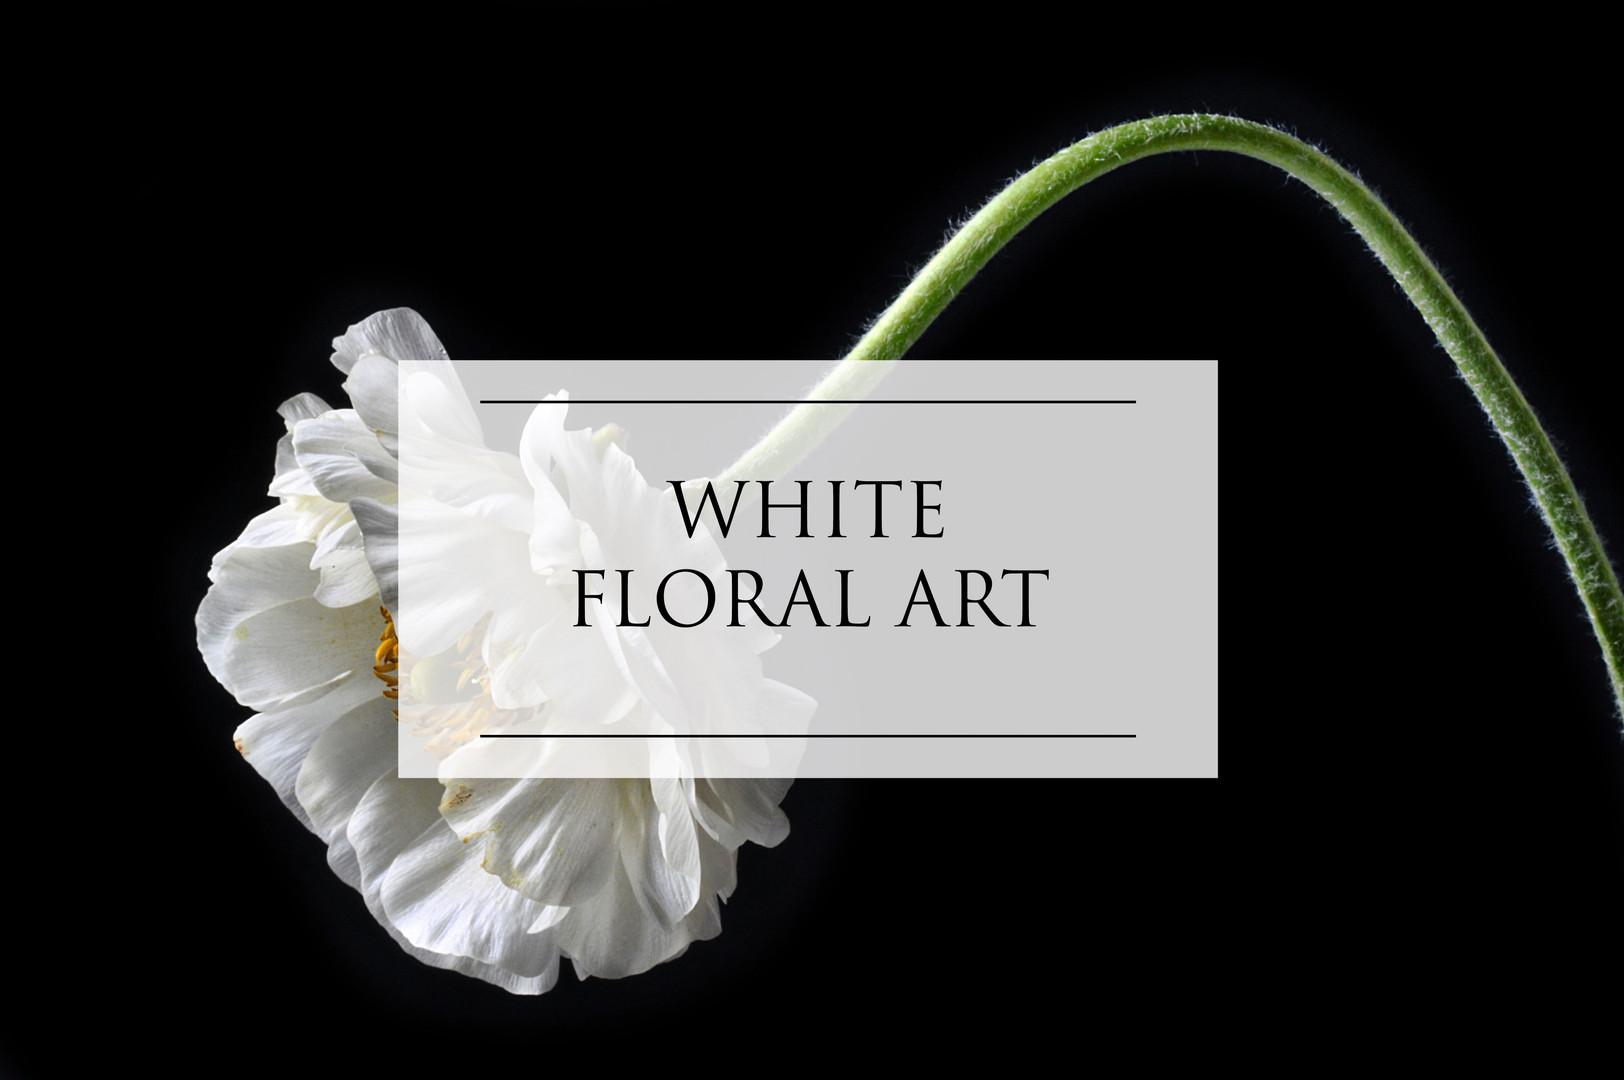 WHITE FLORAL ART